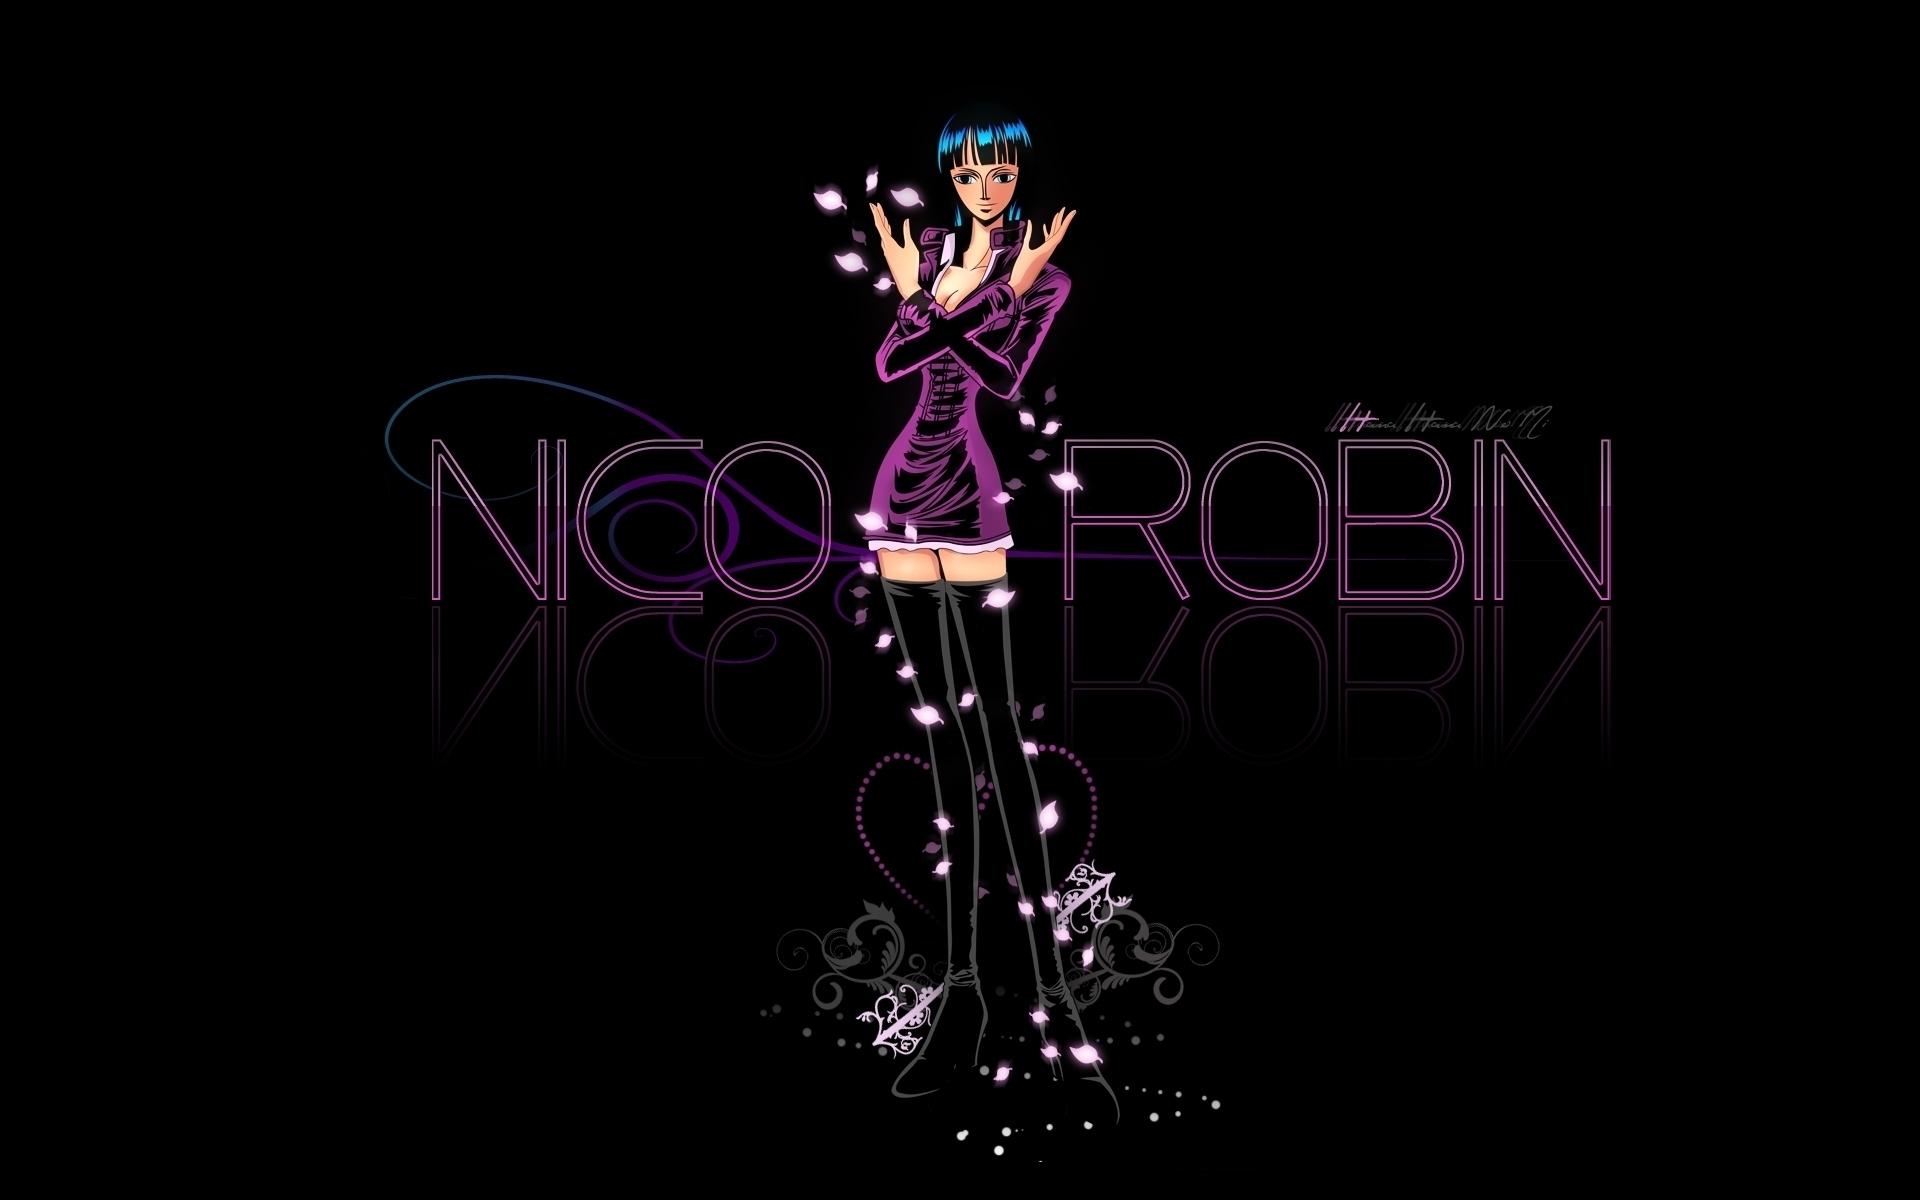 Iphone 5s Lock Screen Wallpaper For Girls Nico Robin One Piece Hd Wallpaper